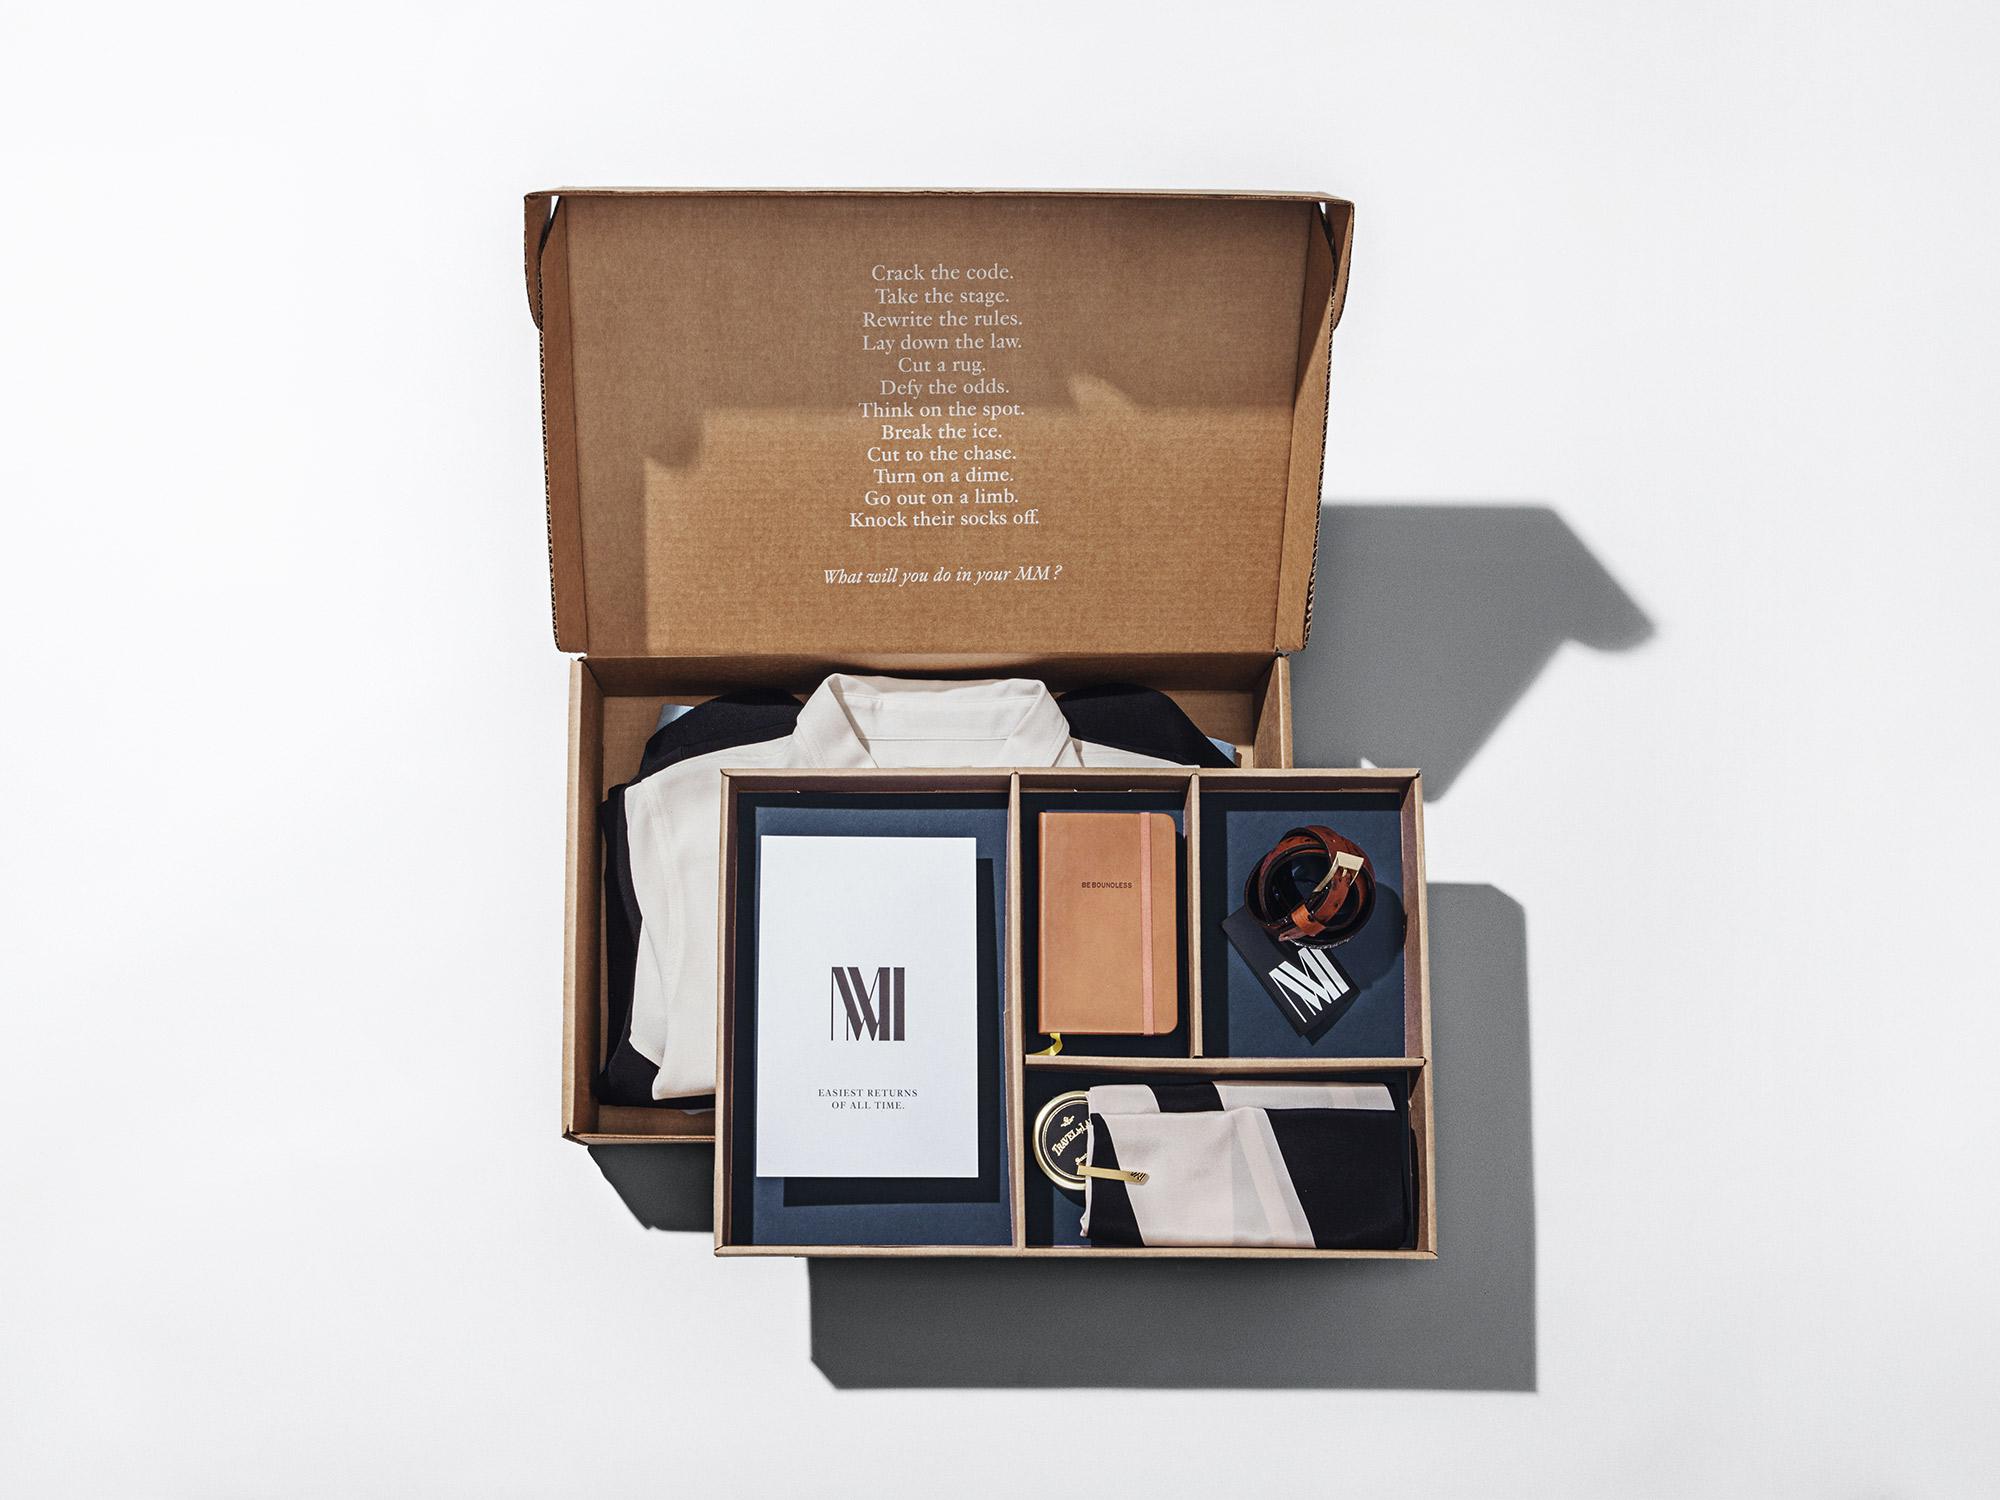 Mm Lafleur Reimagines E Commerce With A Bento Box Daily